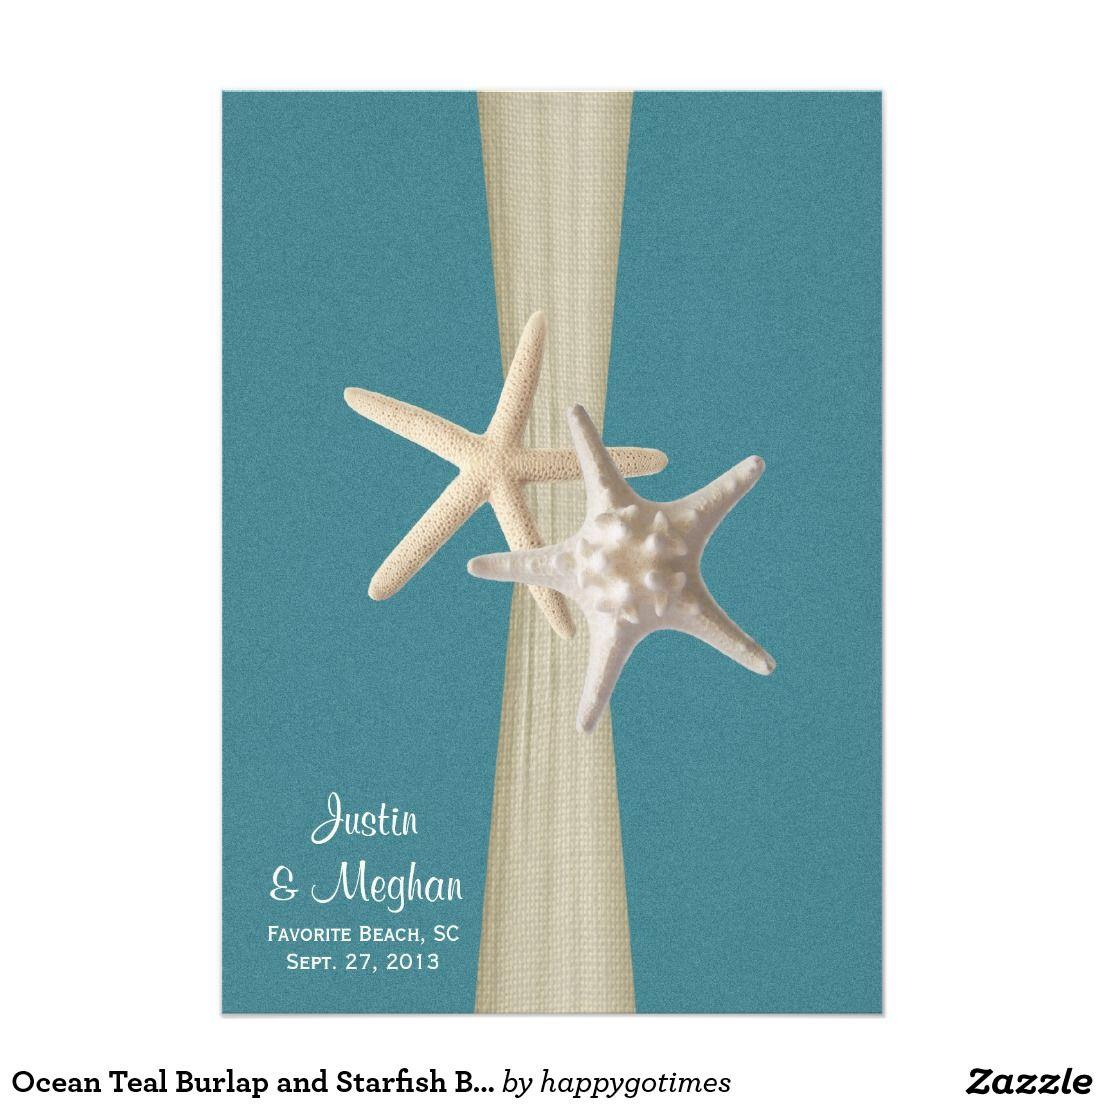 Teal beach wedding  Ocean Teal Burlap and Starfish Beach Wedding Card  Starfish